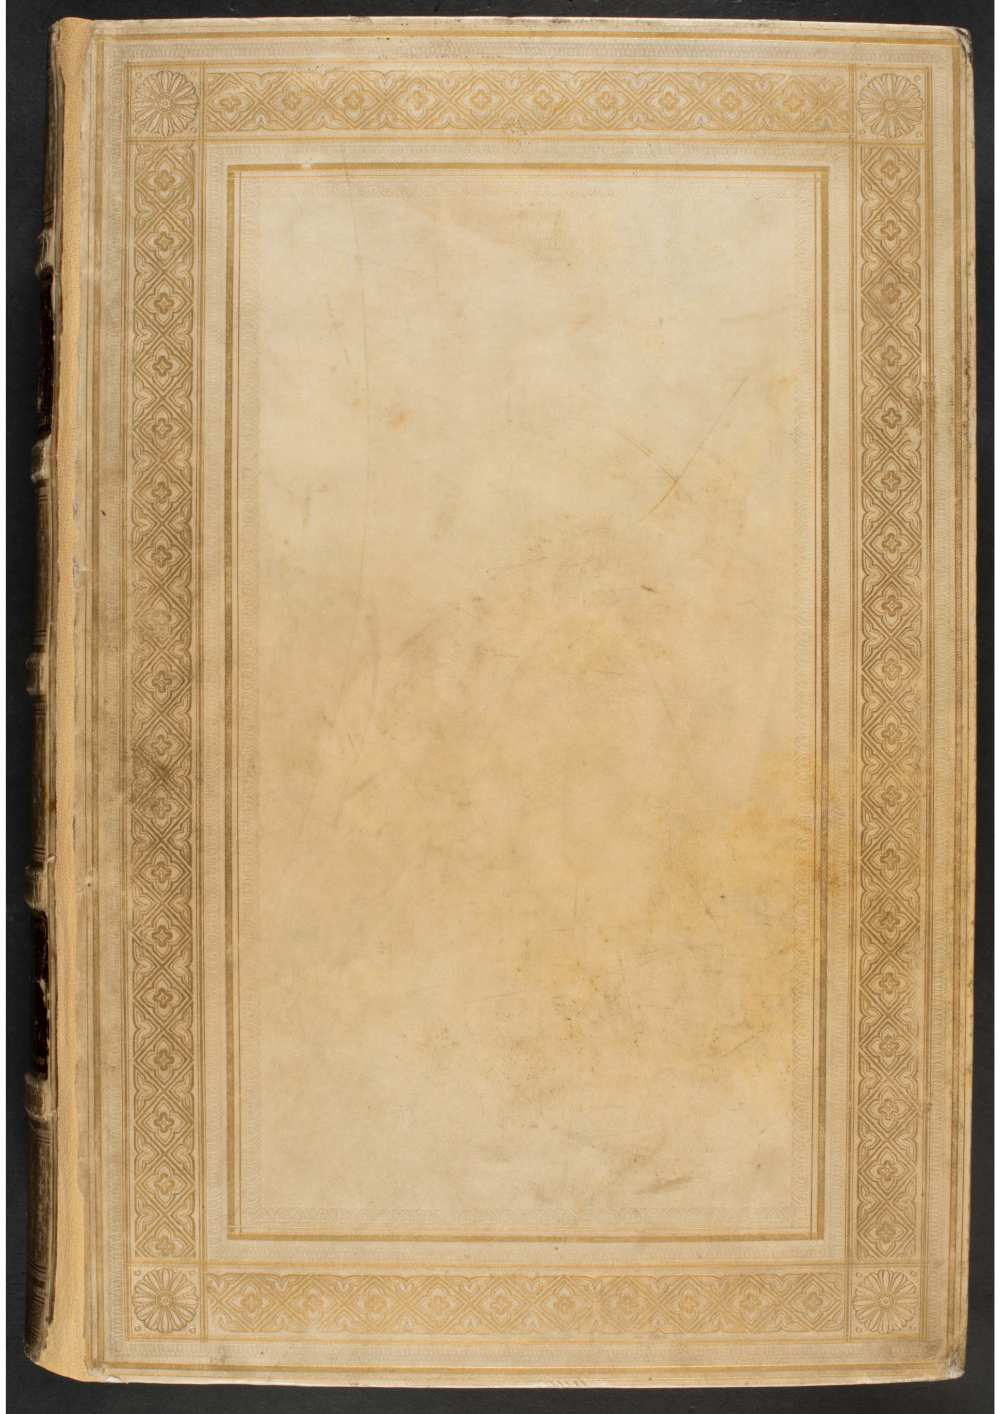 Firenze, Biblioteca Nazionale Centrale: Banco Rari 12. A kép forrása: Internet Archive https://archive.org/details/b.-r.-12_202101/page/n1/mode/1up